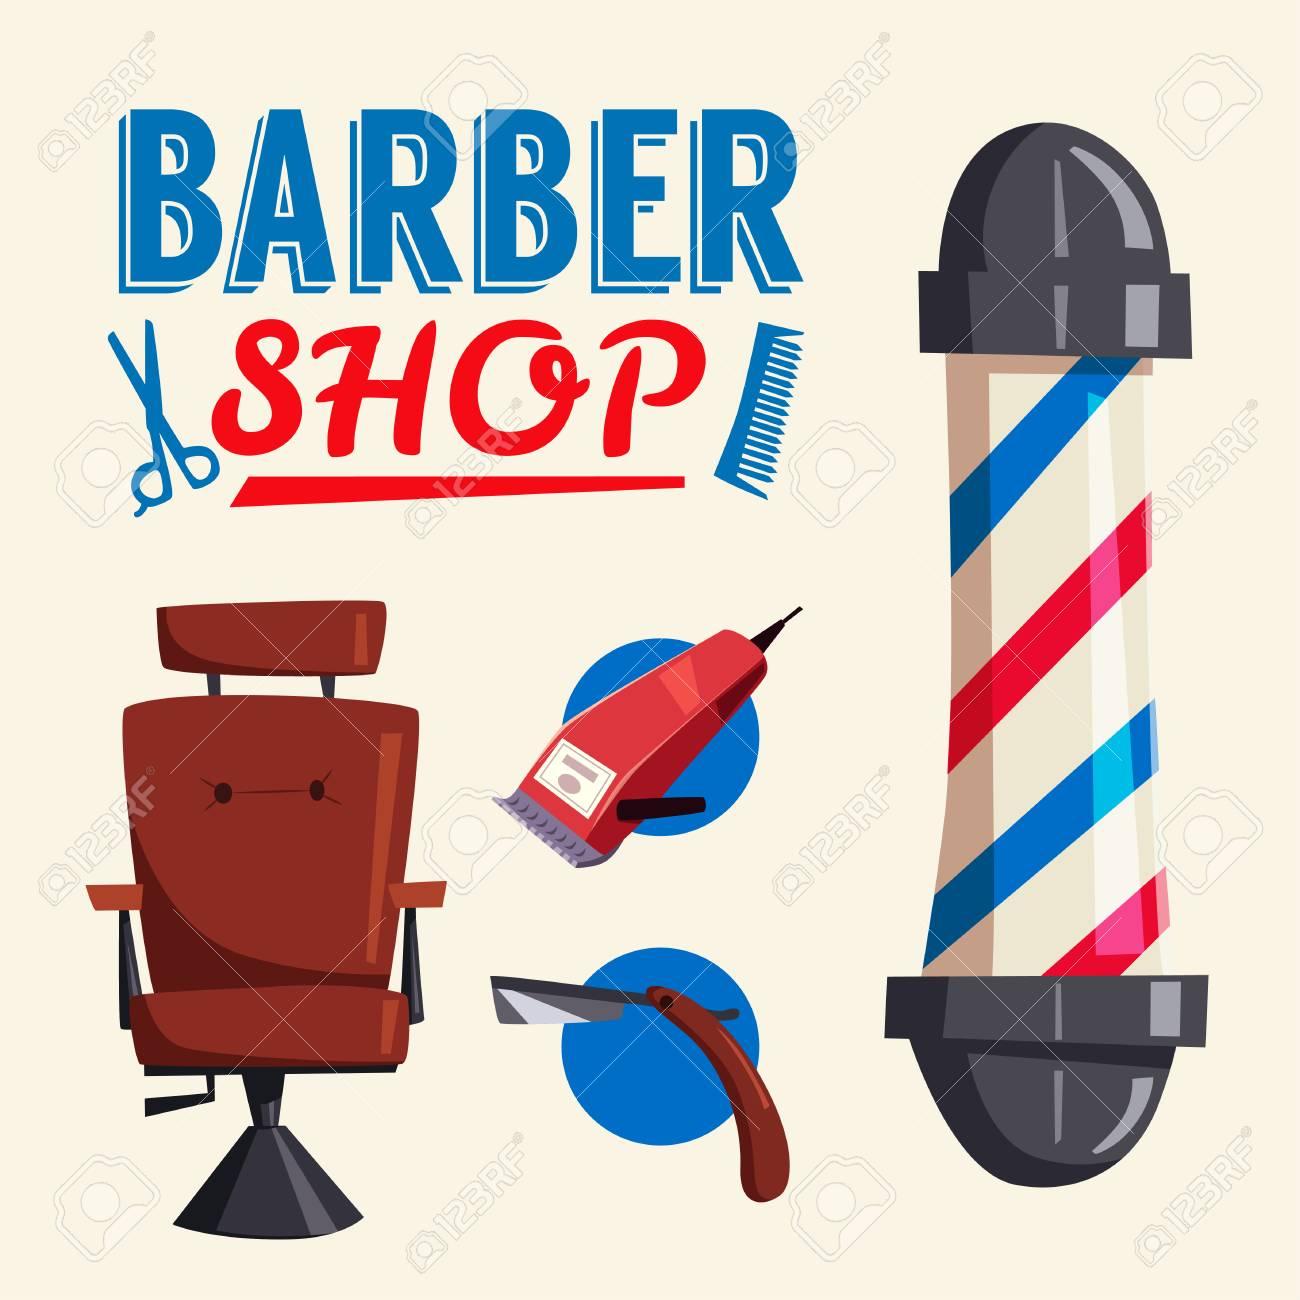 Lounge Stoel Retro.Barber Shop Cartoon Vector Illustration Lounge Chair Scissors